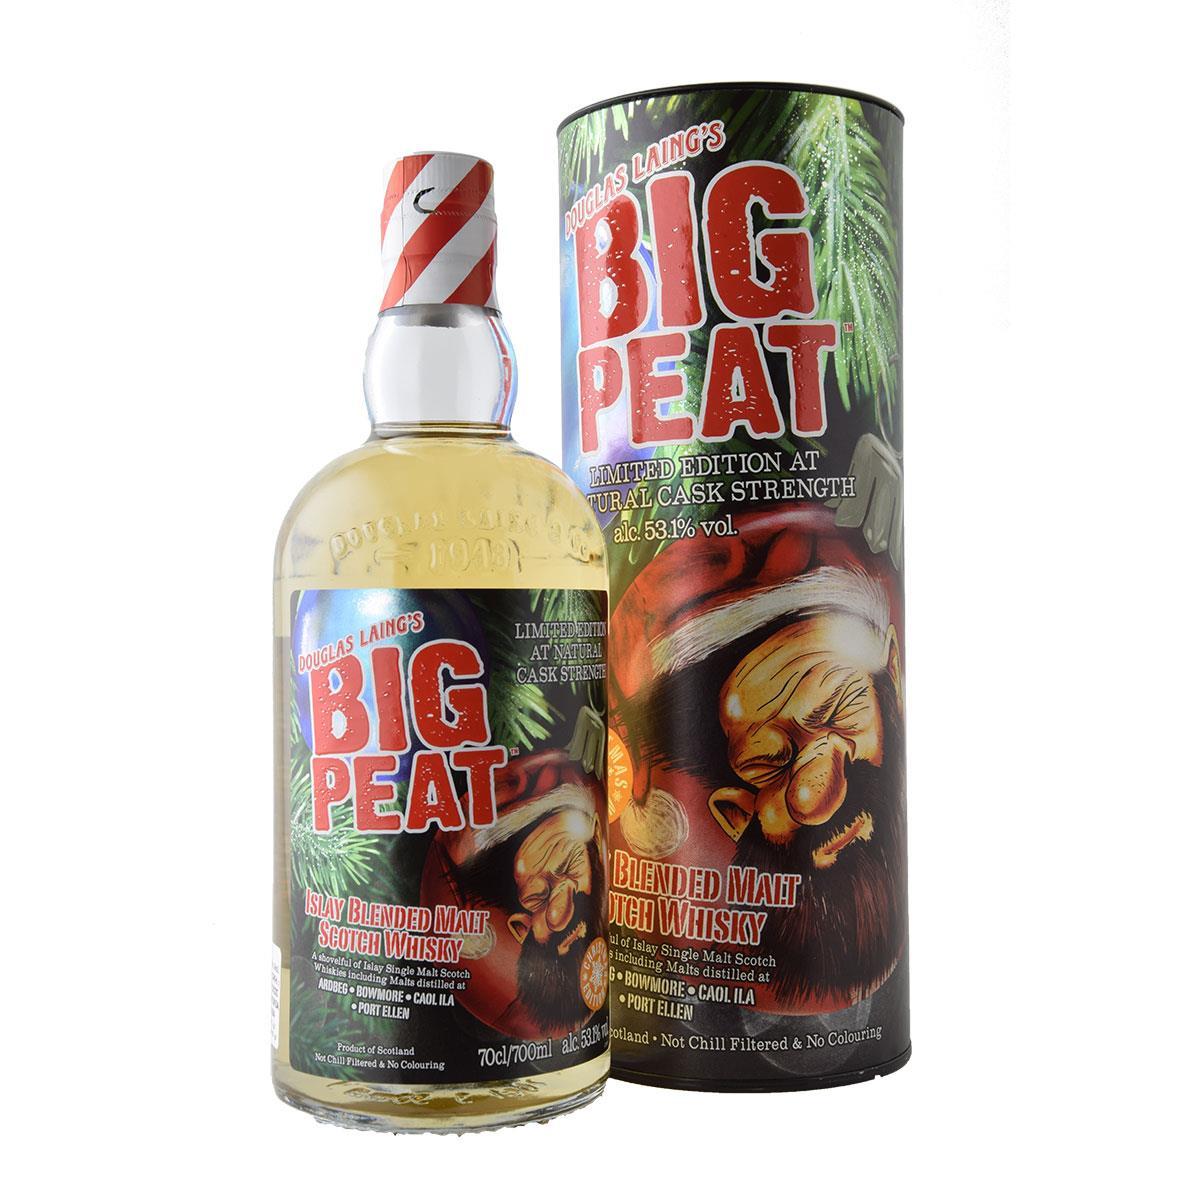 Big Peat Christmas Limited Edition 2020 700ml